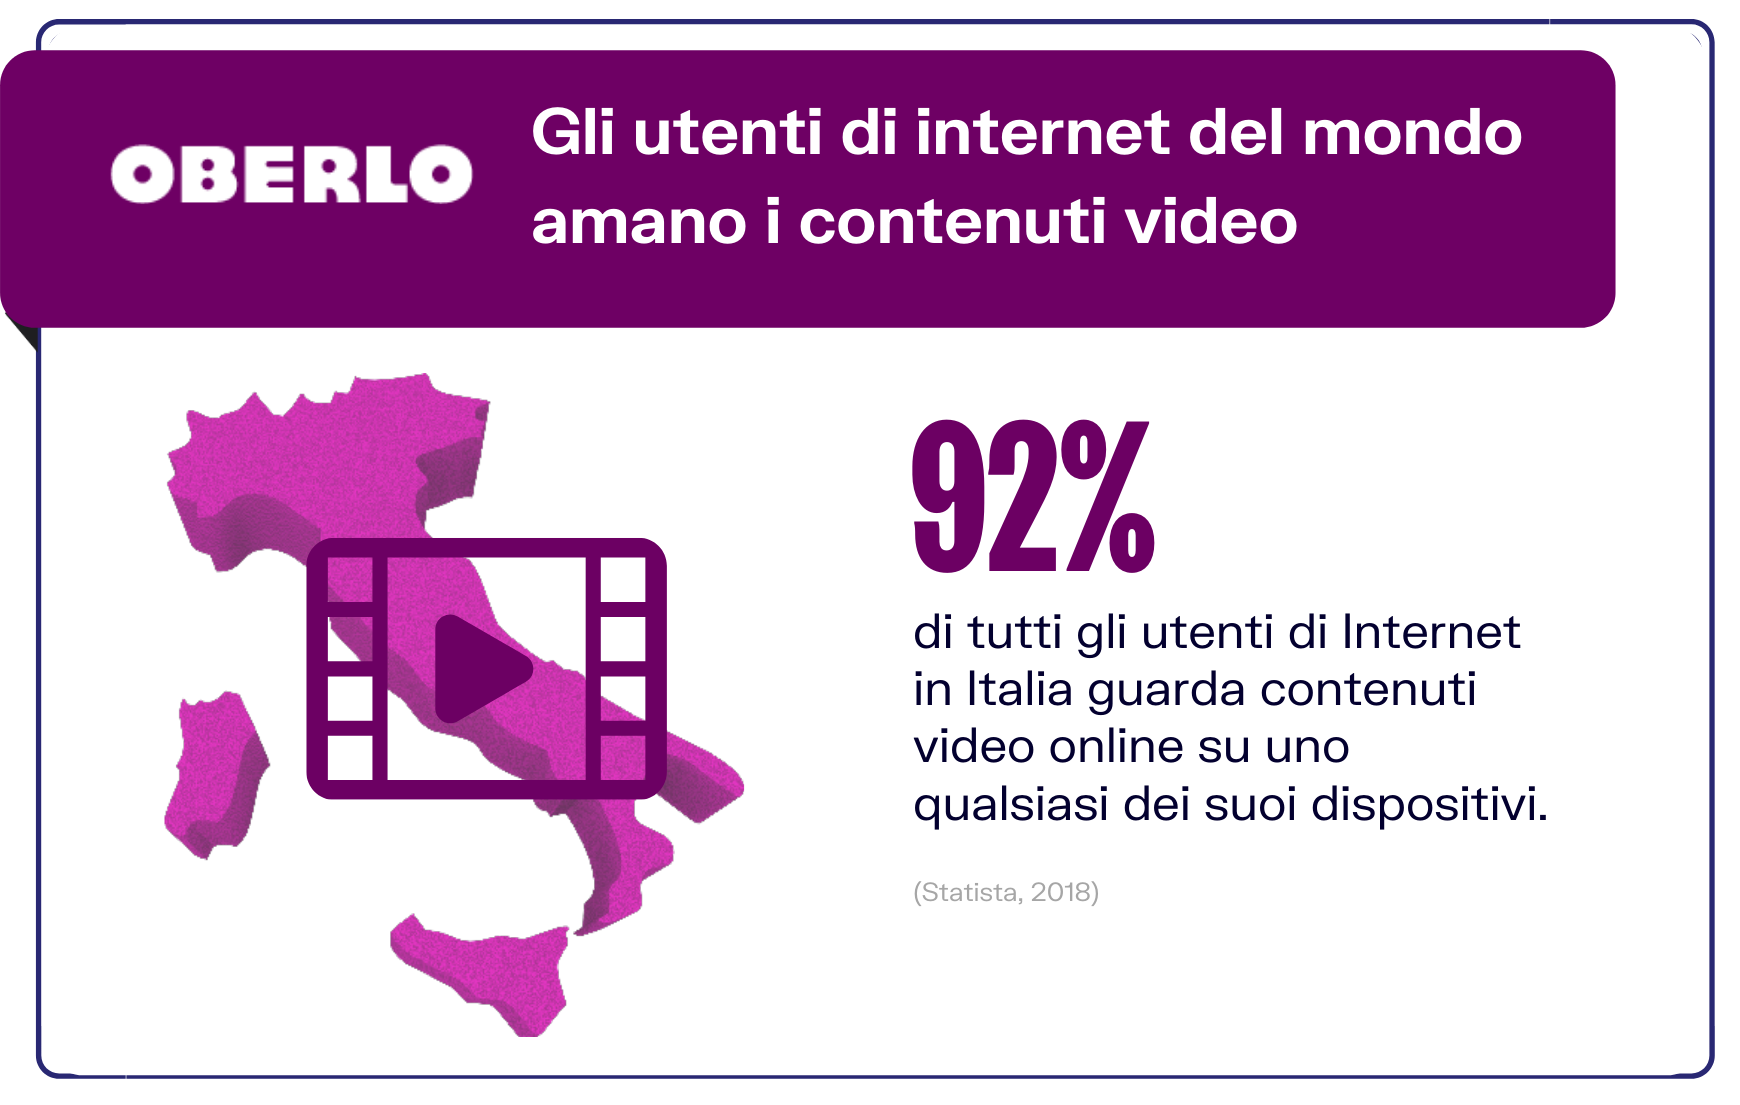 italiani guardano i video